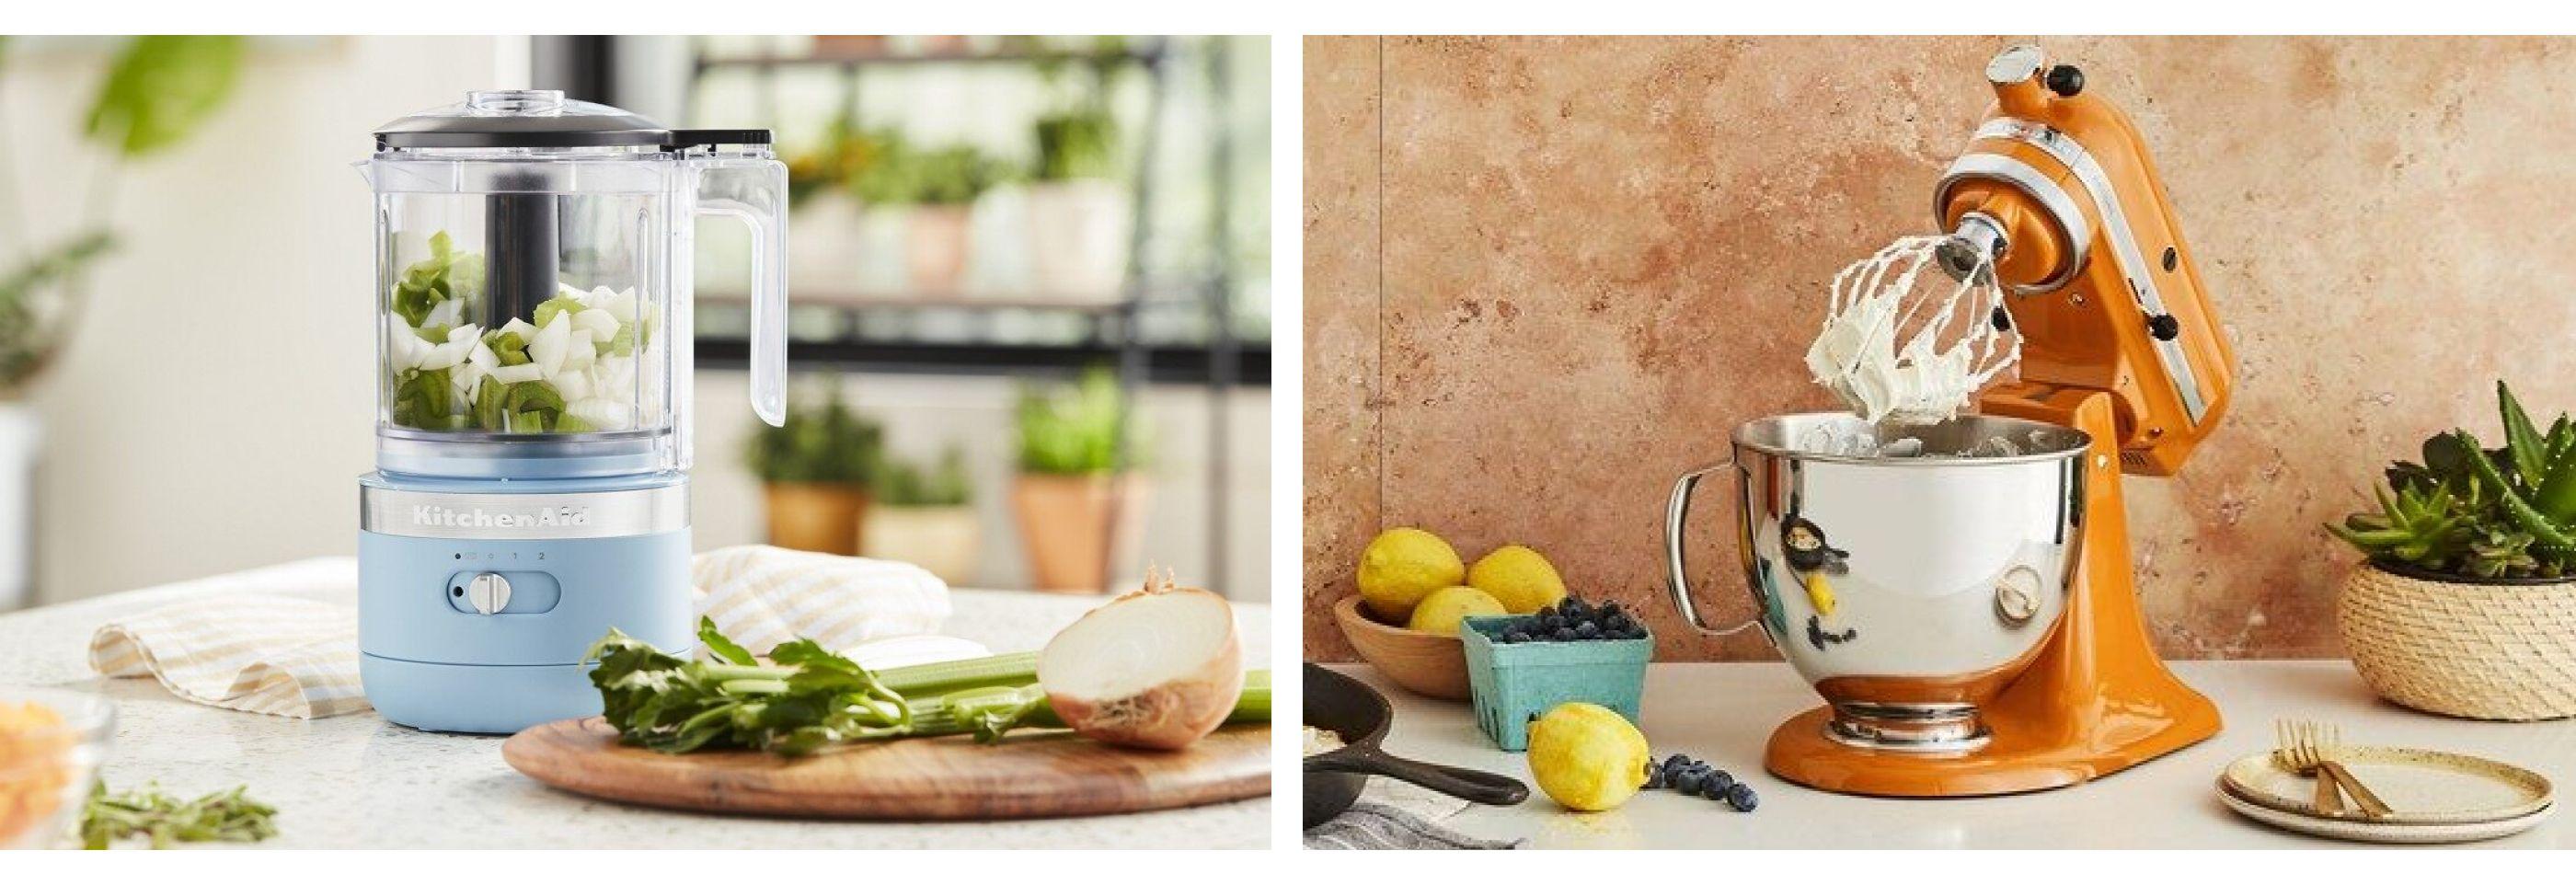 KitchenAid® stand mixer and food processor comparison picture